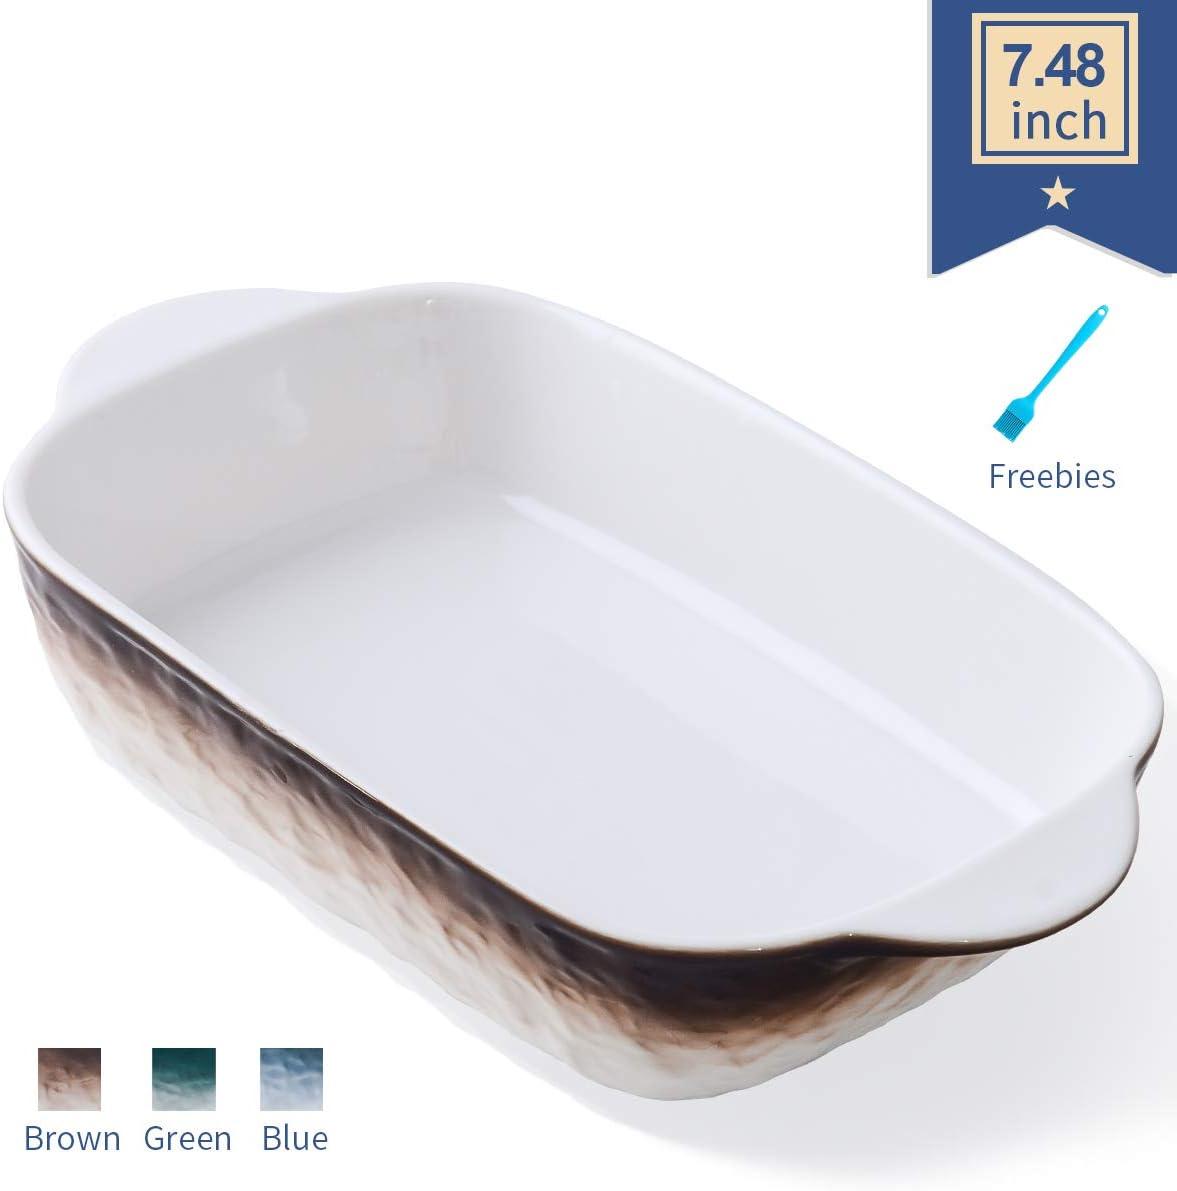 Ceramics Rectangular Casserole Dish, Baking Dishes with Handles for Oven, Ceramic Baking Pan, Lasagna Pan, Individual Bakeware 7.48x5.12 Inch, Brown